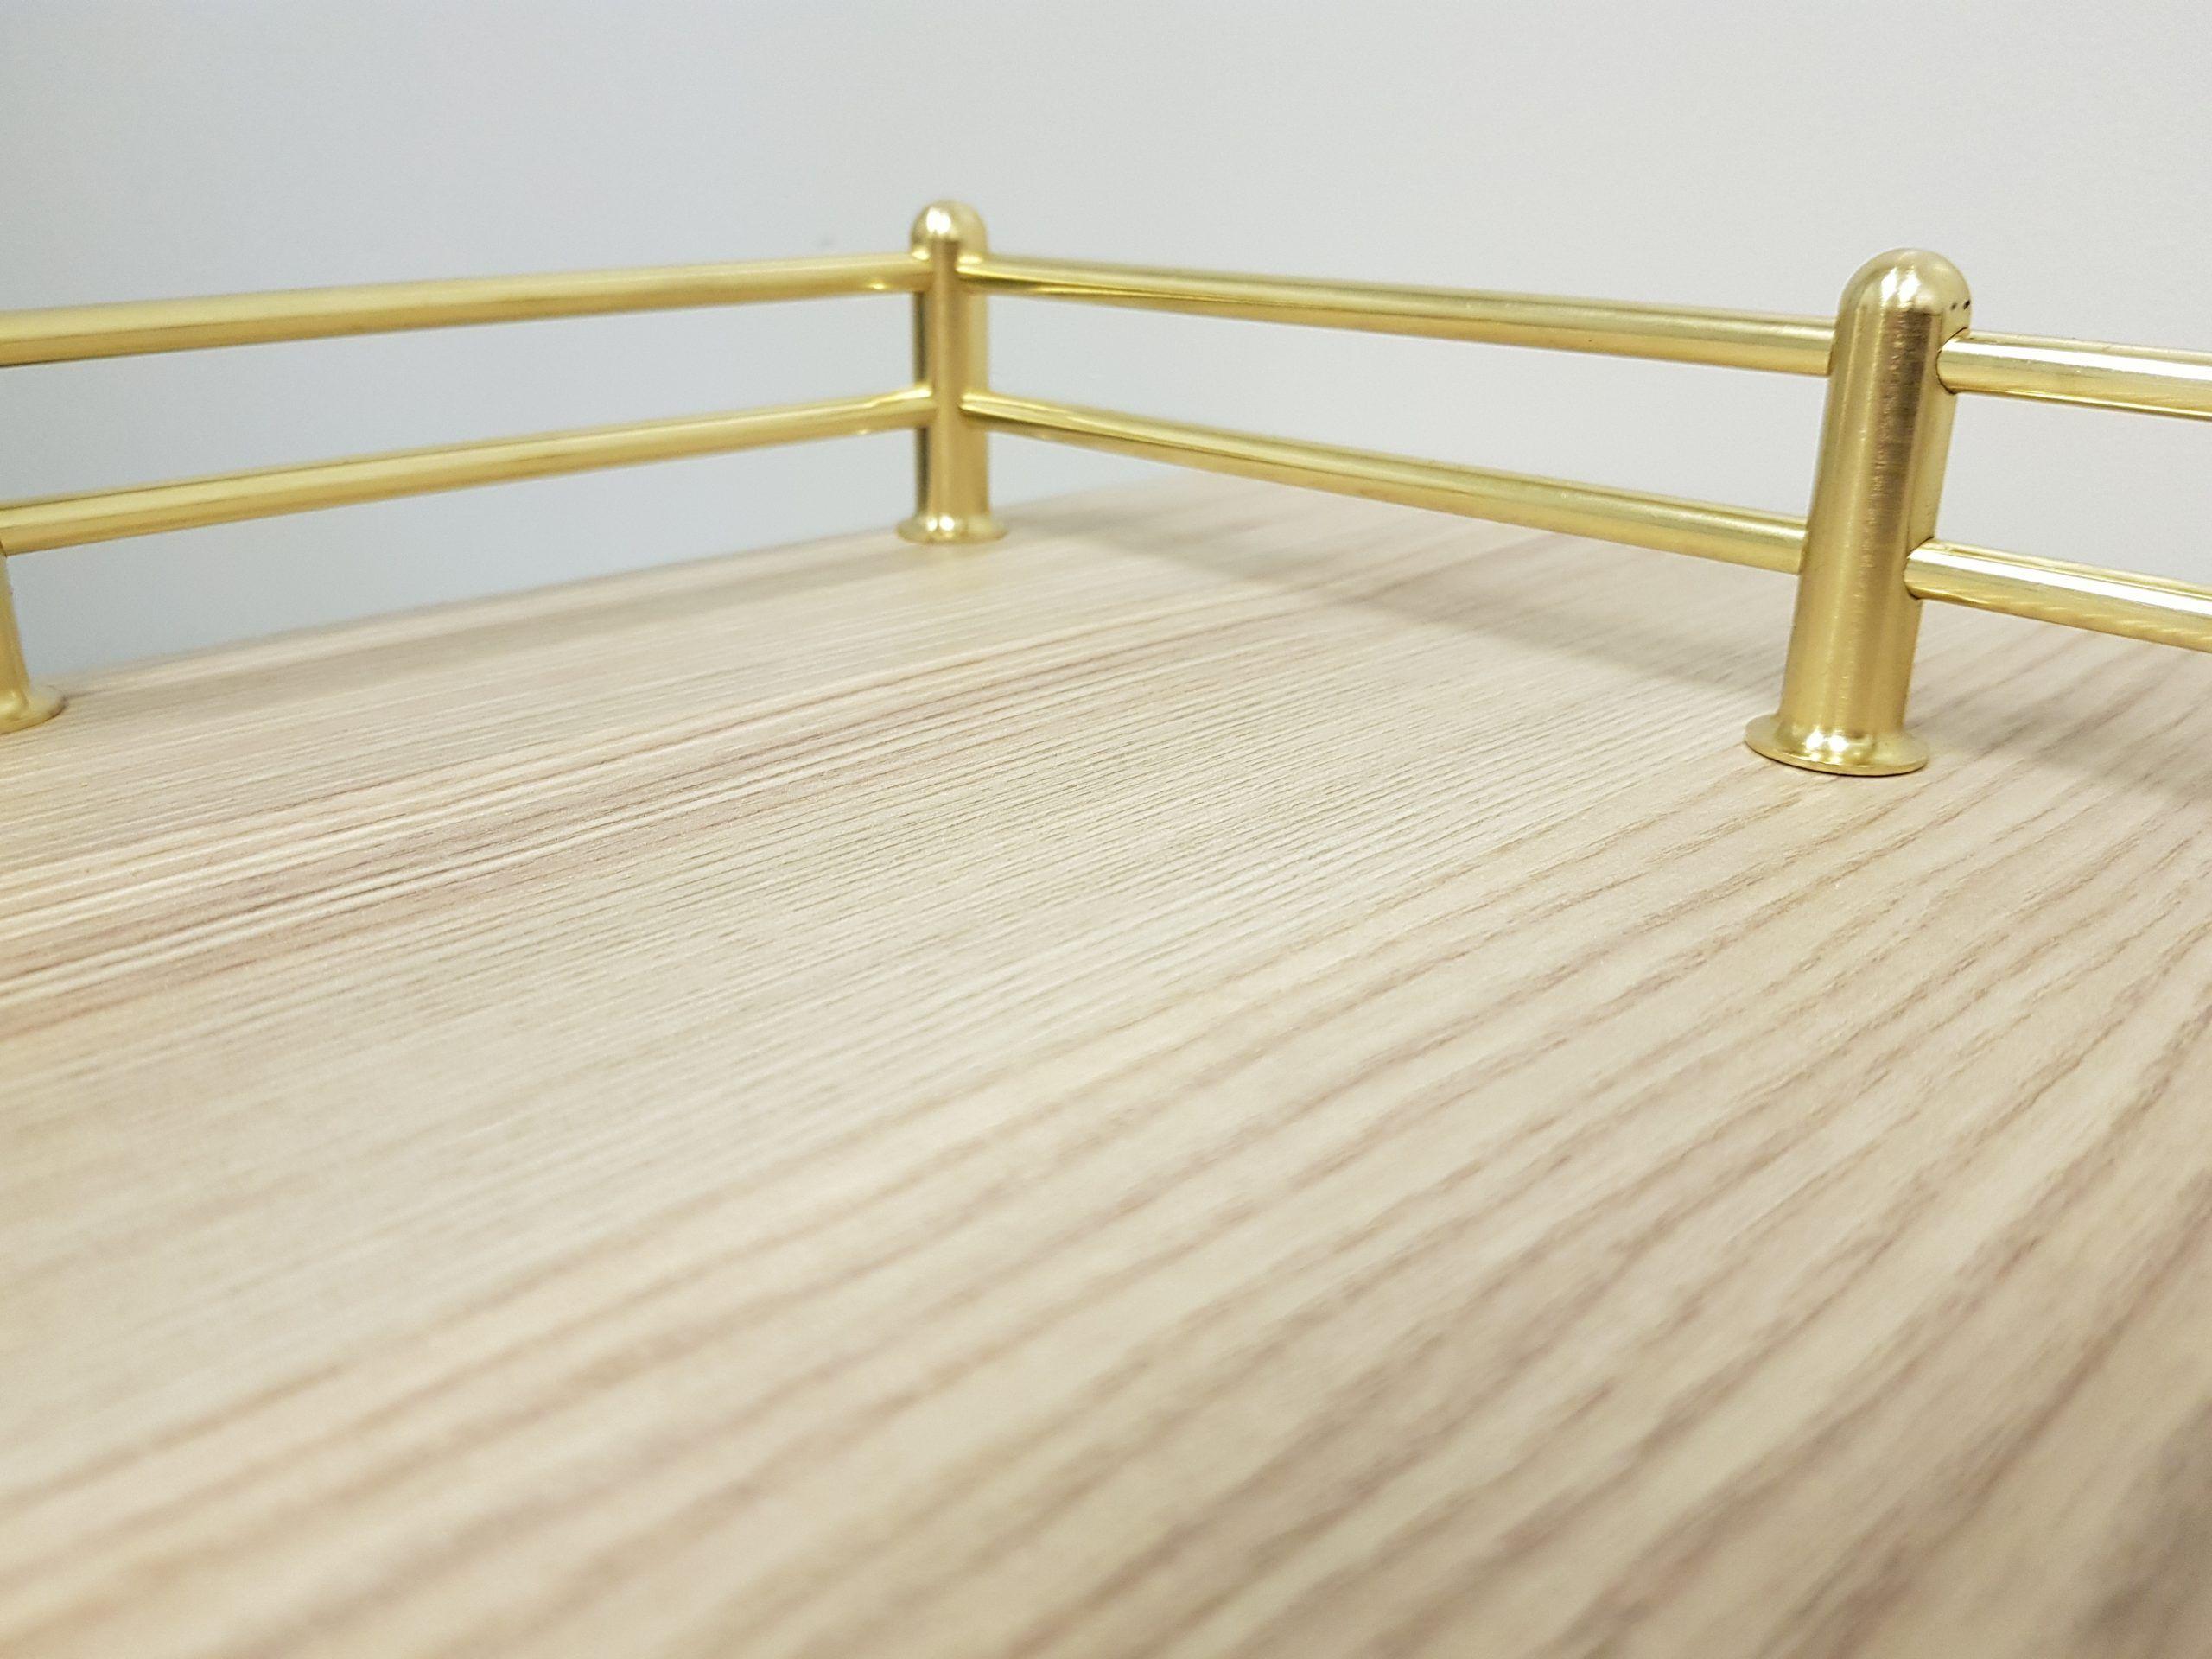 Brass Fiddle Rail